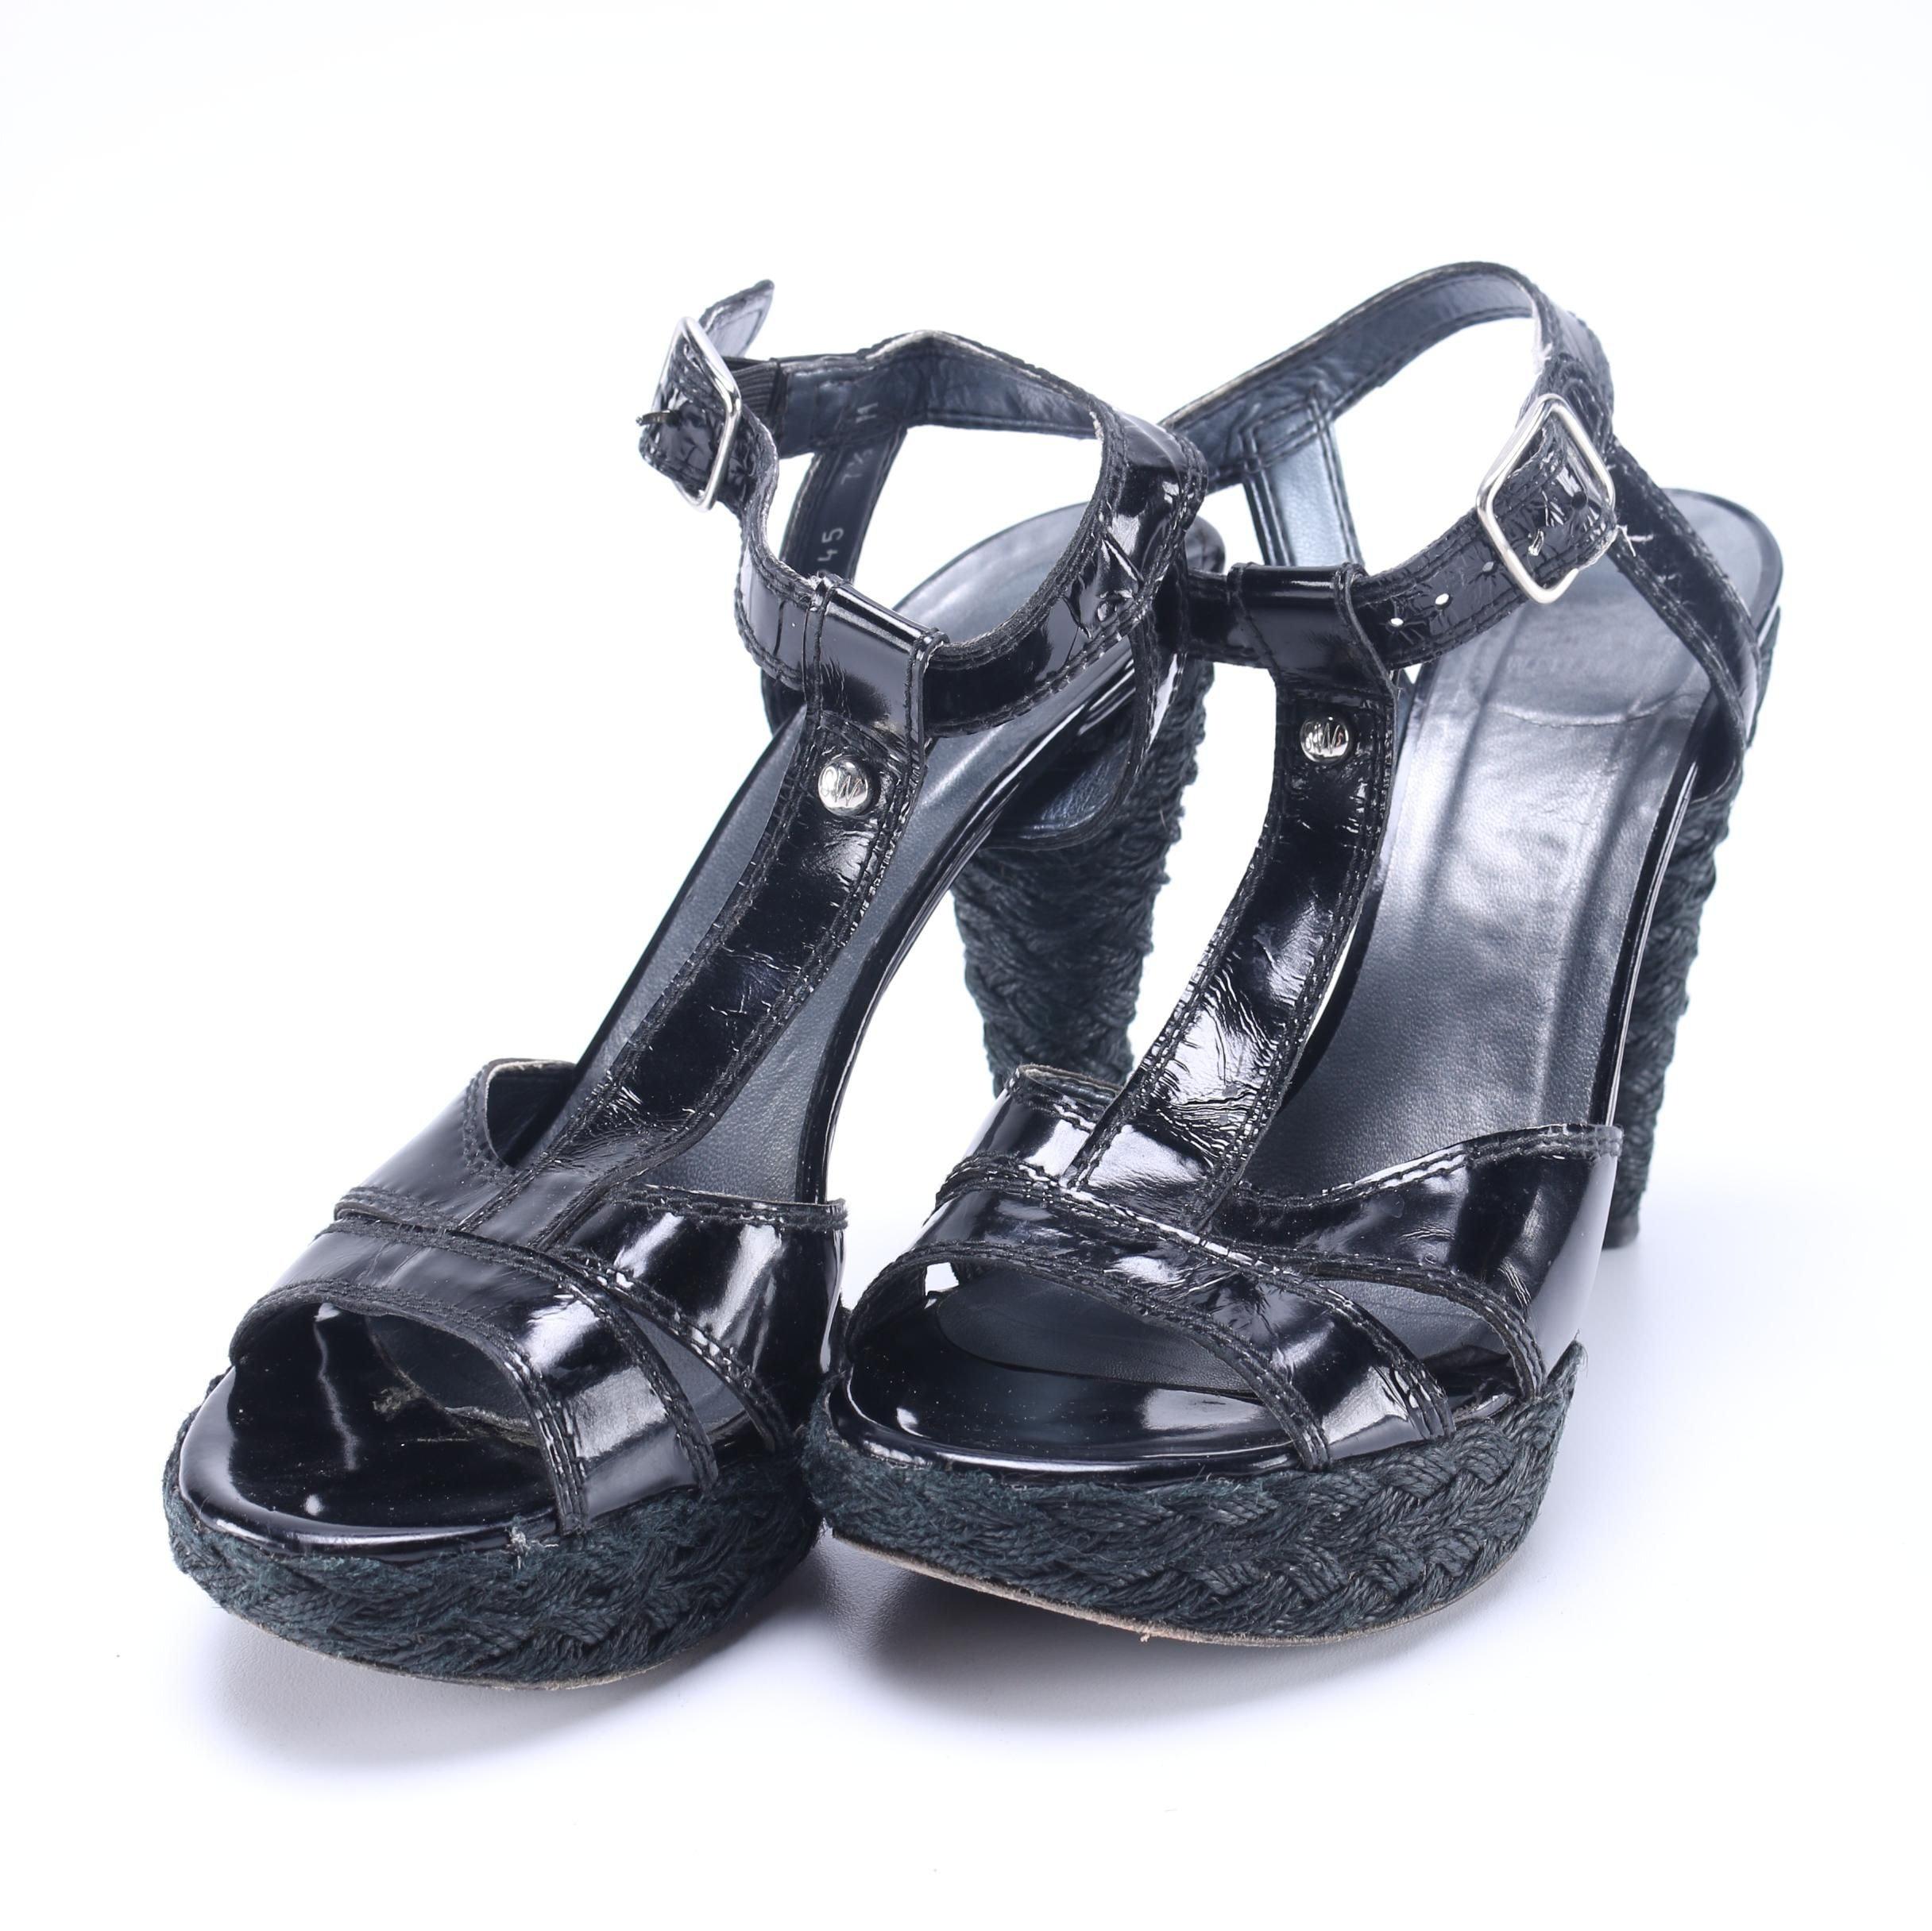 Stuart Weitzman Patent Leather Heels